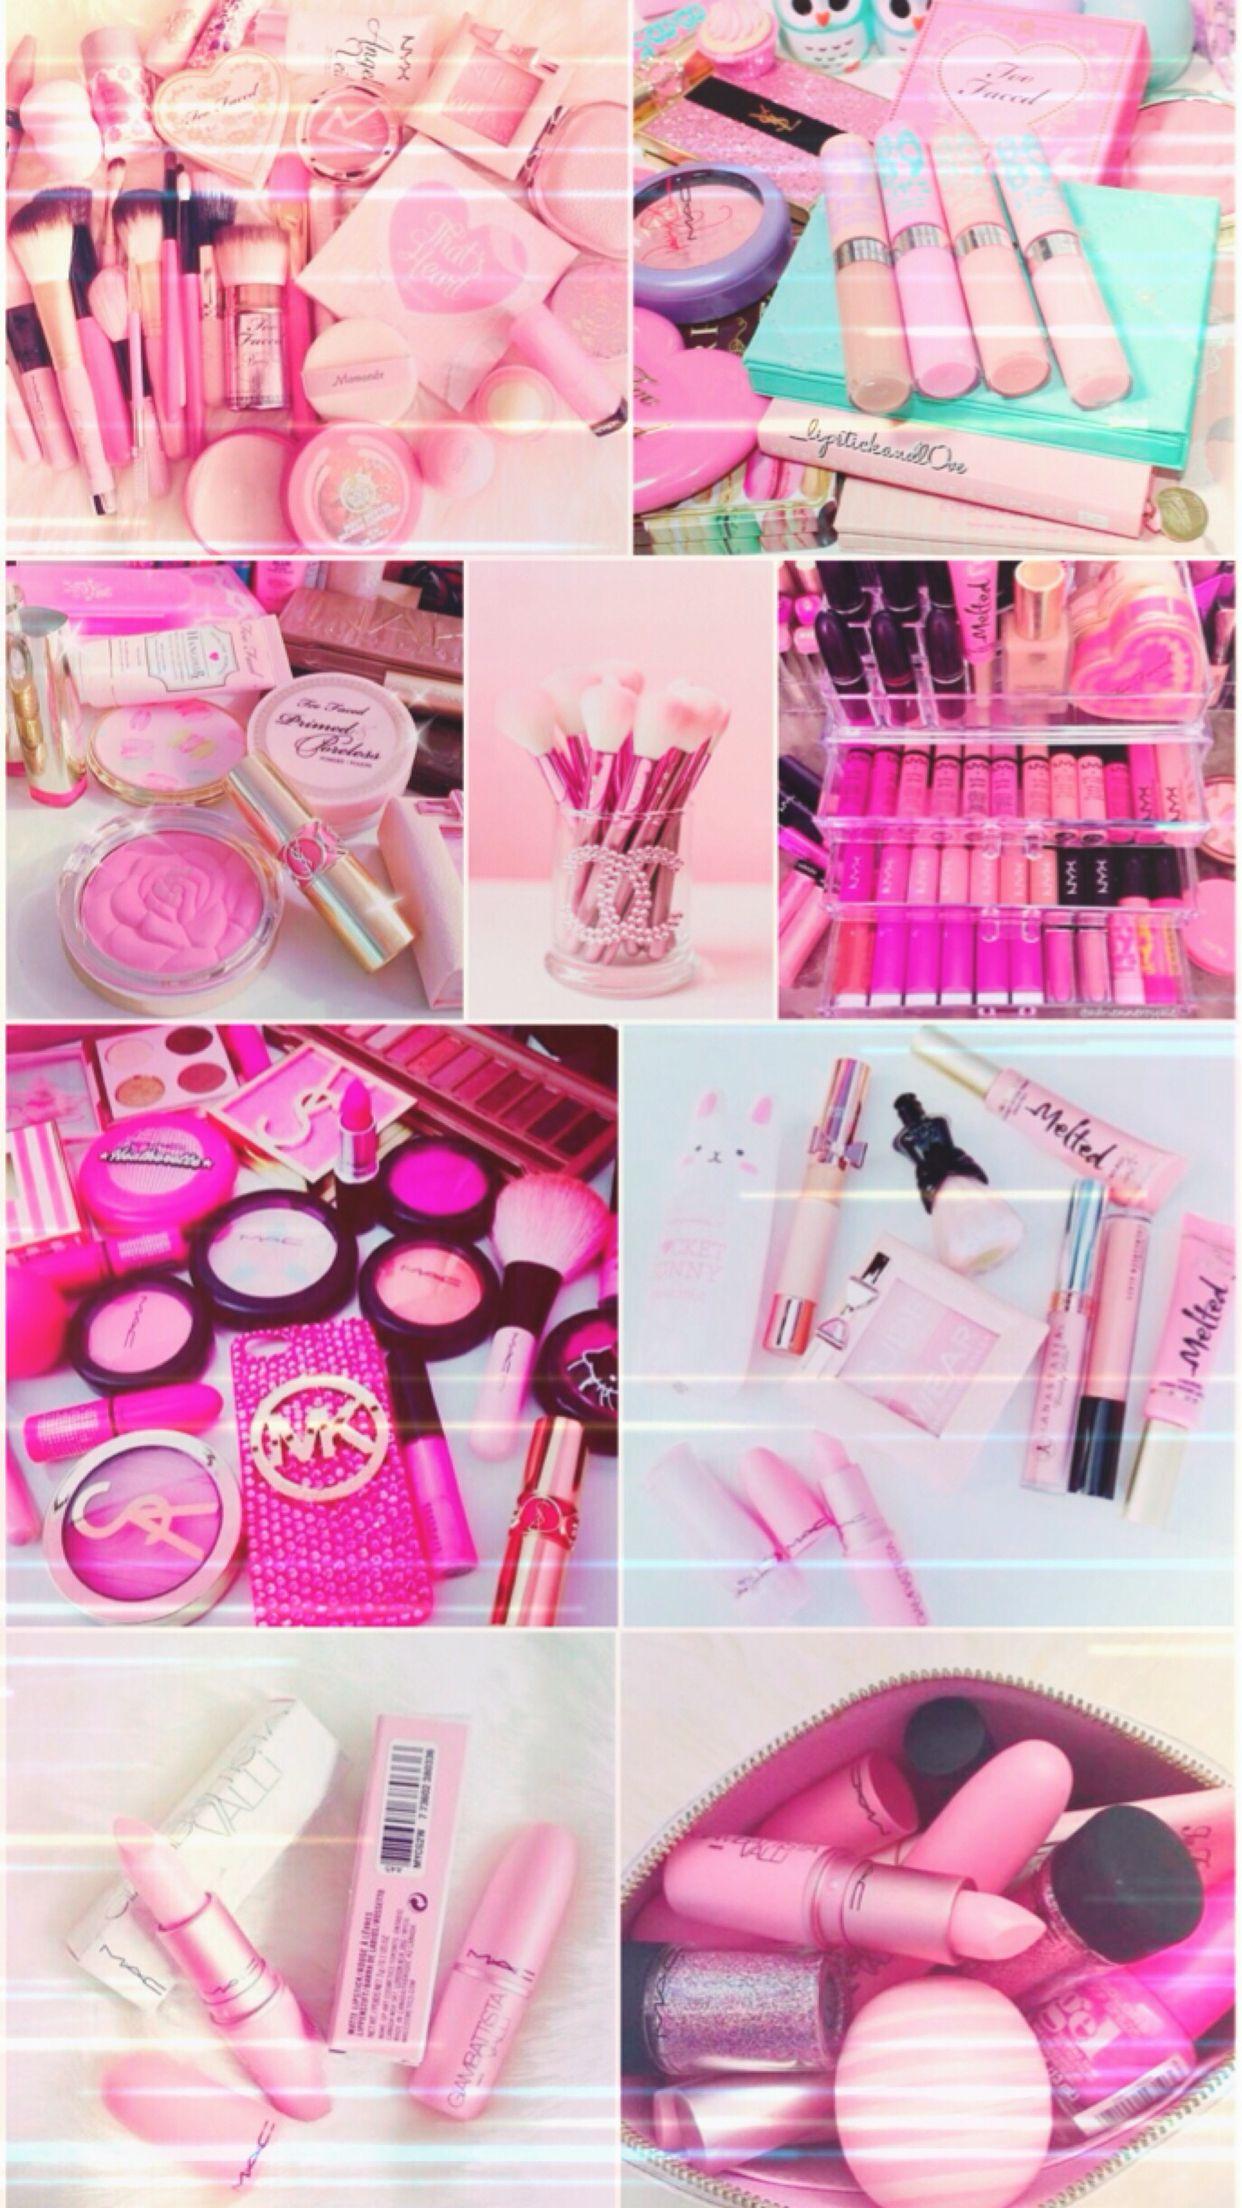 Makeup Wallpaper: Pink Makeup Wallpaper, Background, Cosmetics, IPhone